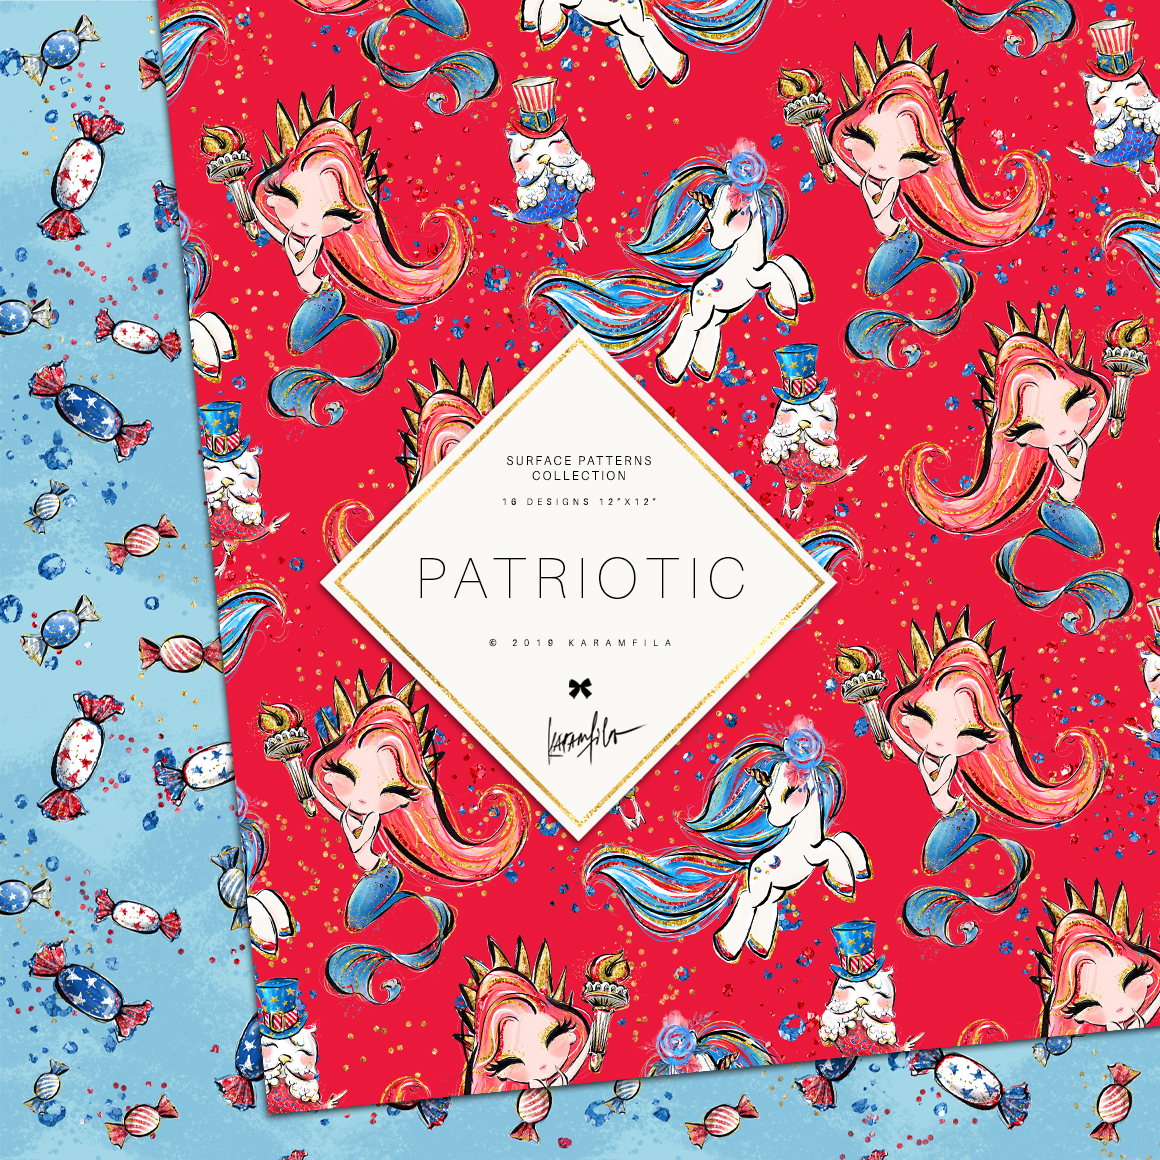 4th of July Mermaid Unicorn Patterns example image 5